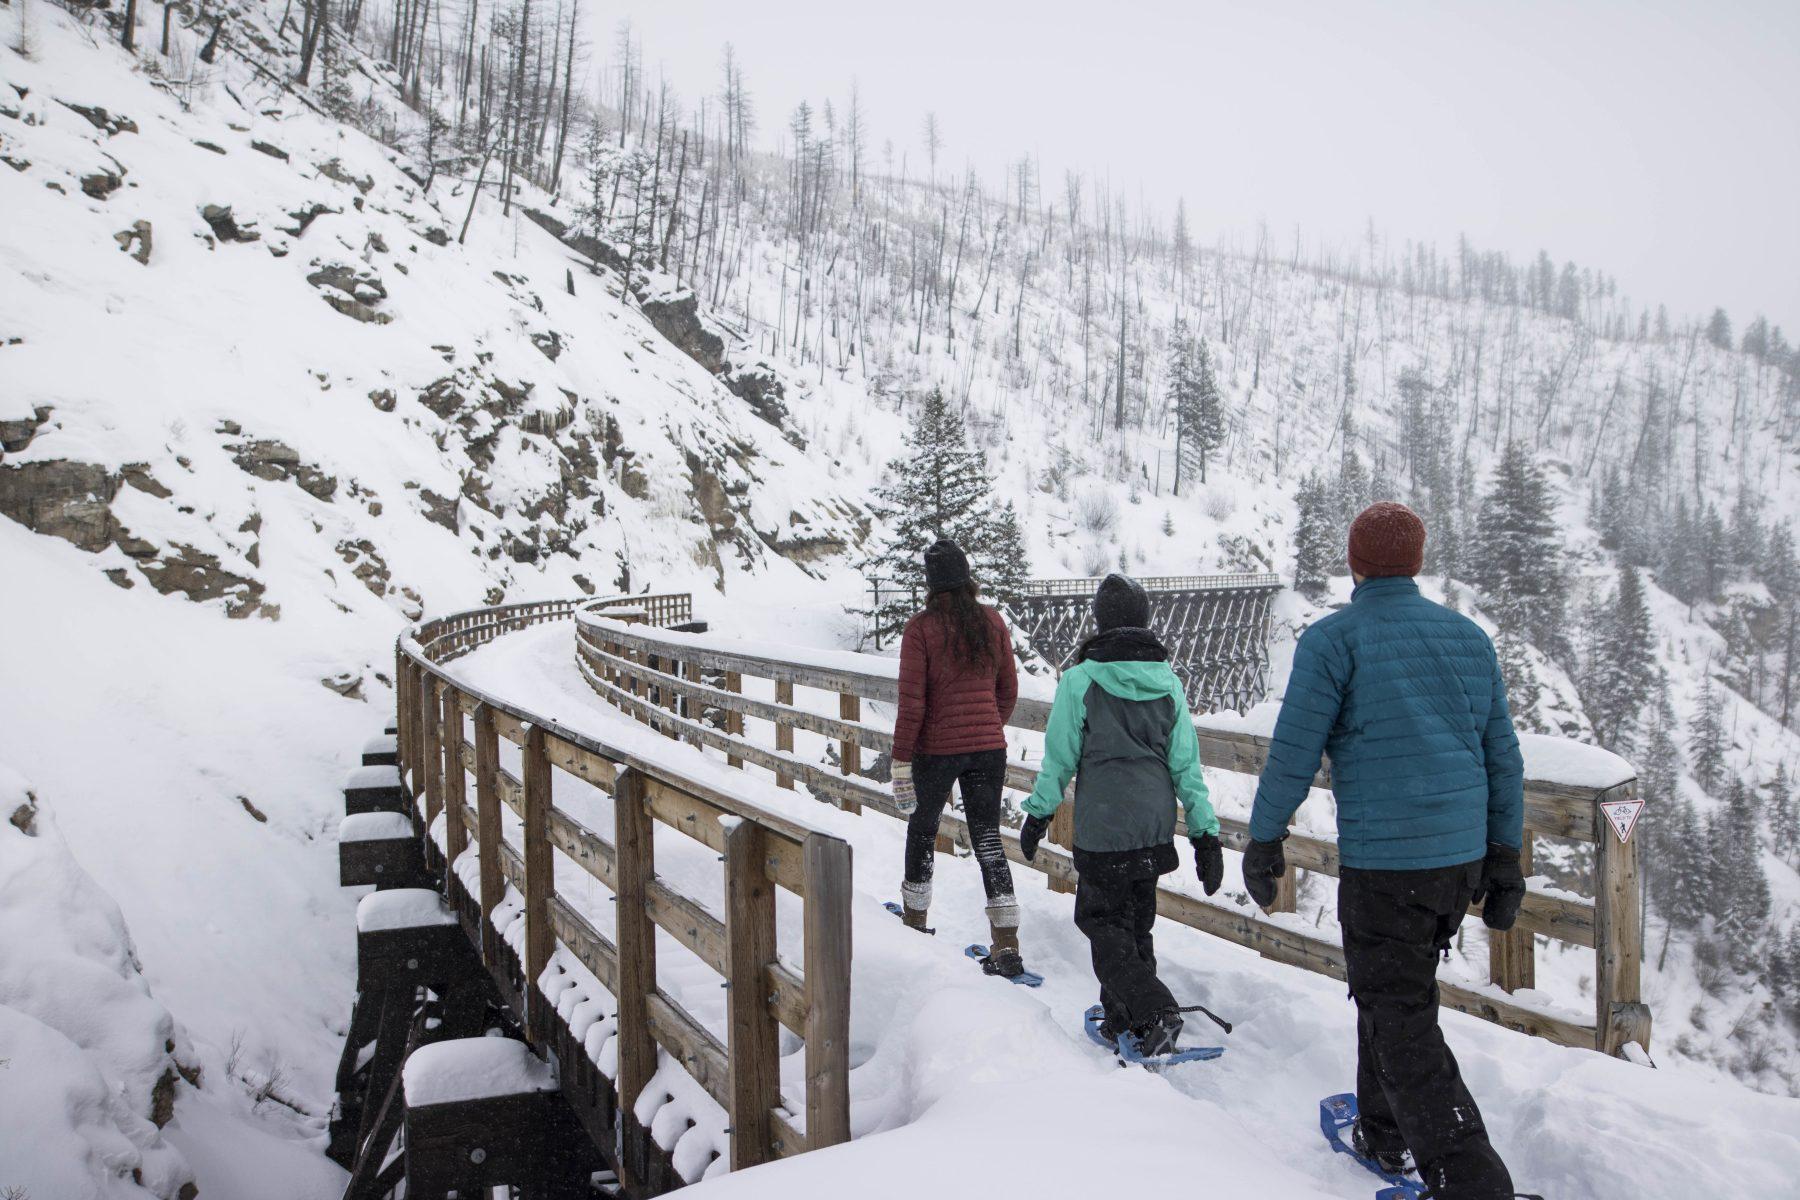 British Columbia, Kelowna - Snowshoe the Myra Canyon Trestles - ©tourismkelowna.com